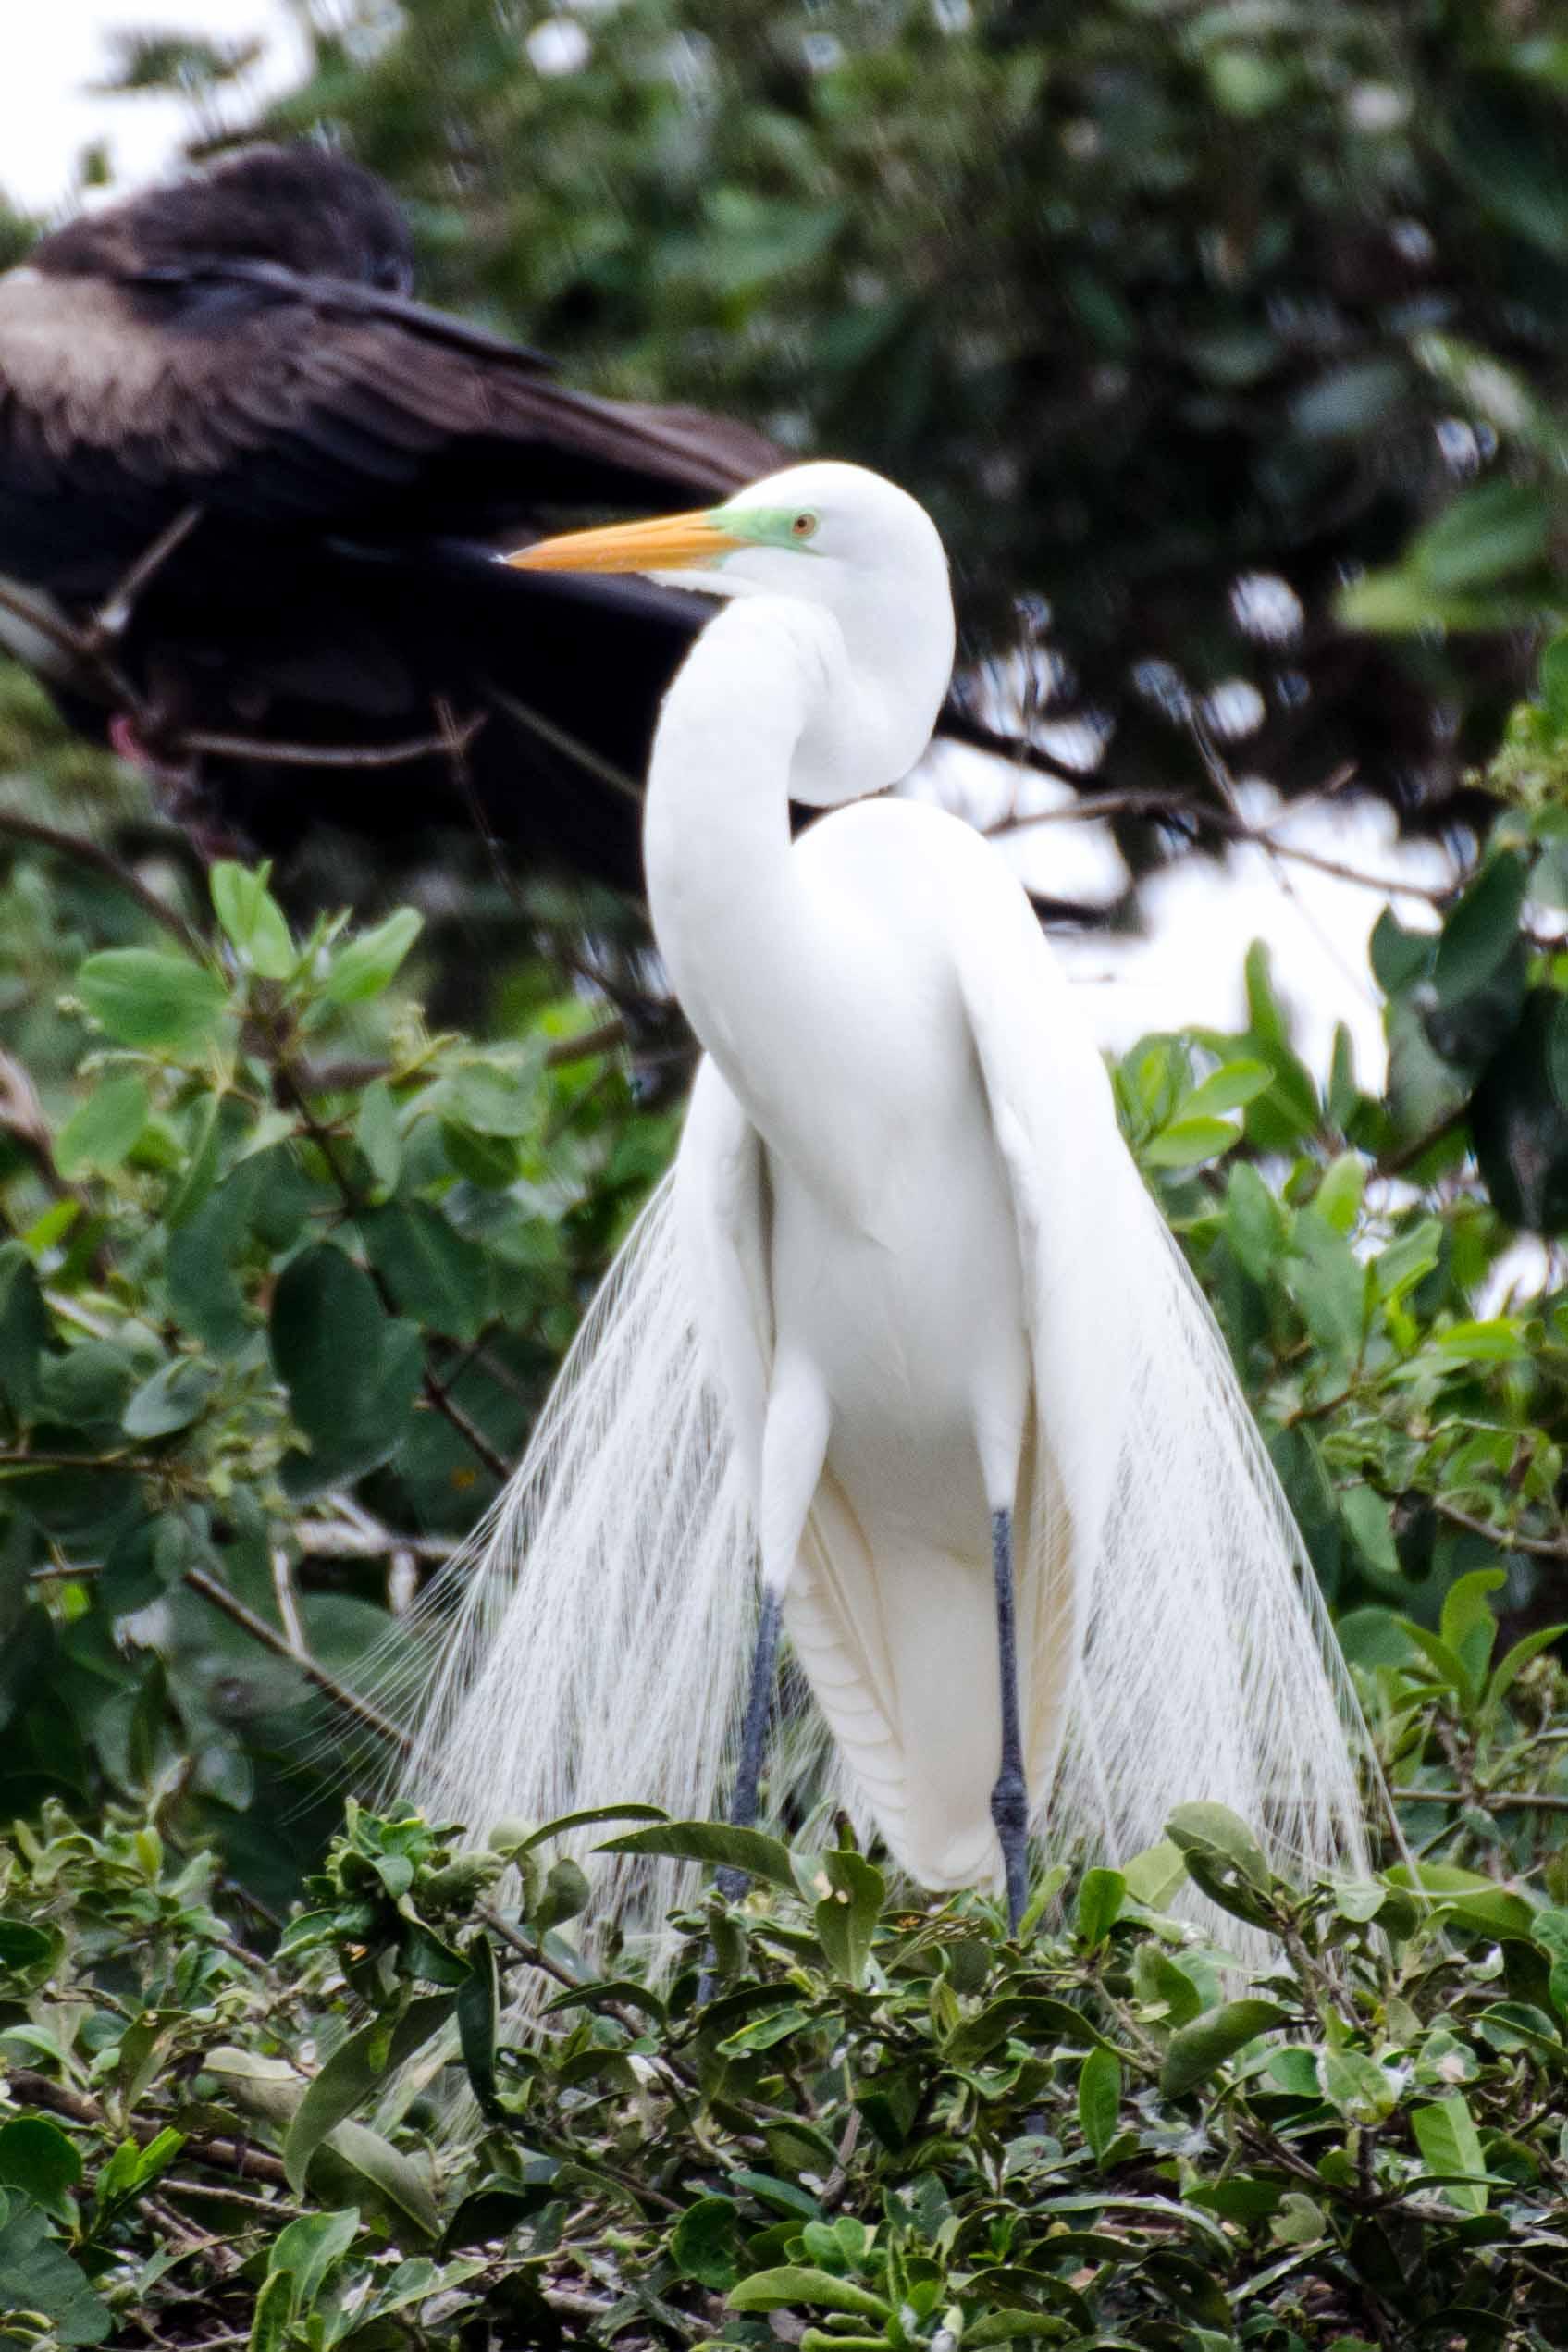 Great Egret, Isla de Corazon, Ecuador | ©Angela Drake / Not Your Average American